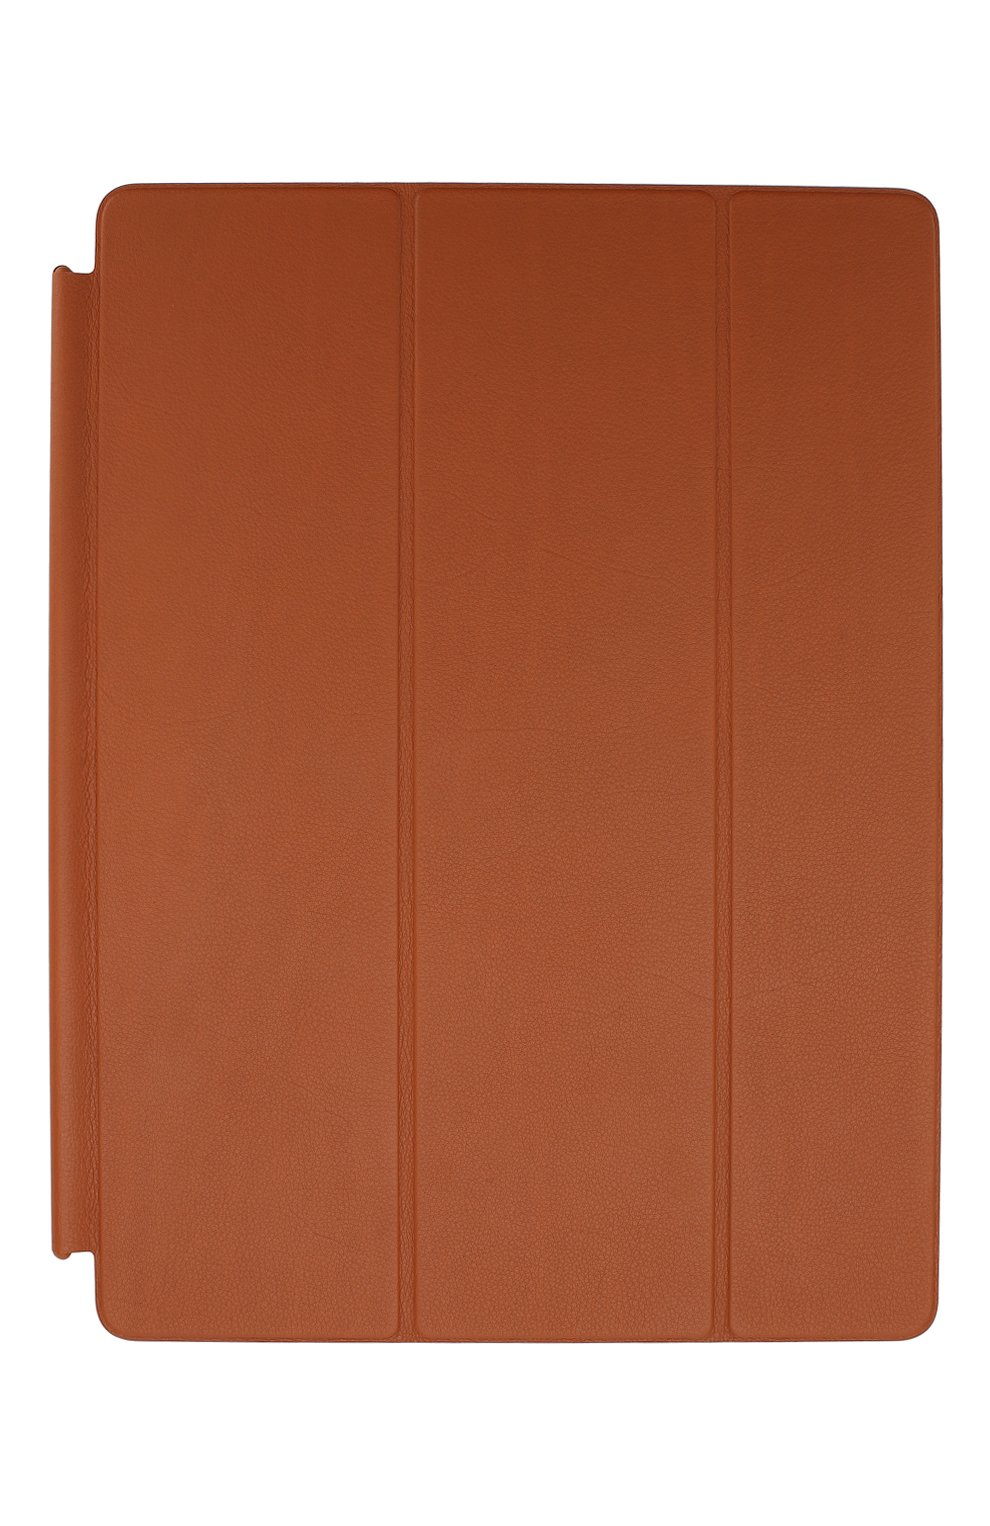 "Чехол smart cover для ipad pro 12.9"" APPLE  коричневого цвета, арт. MPV12ZM/A   Фото 1"